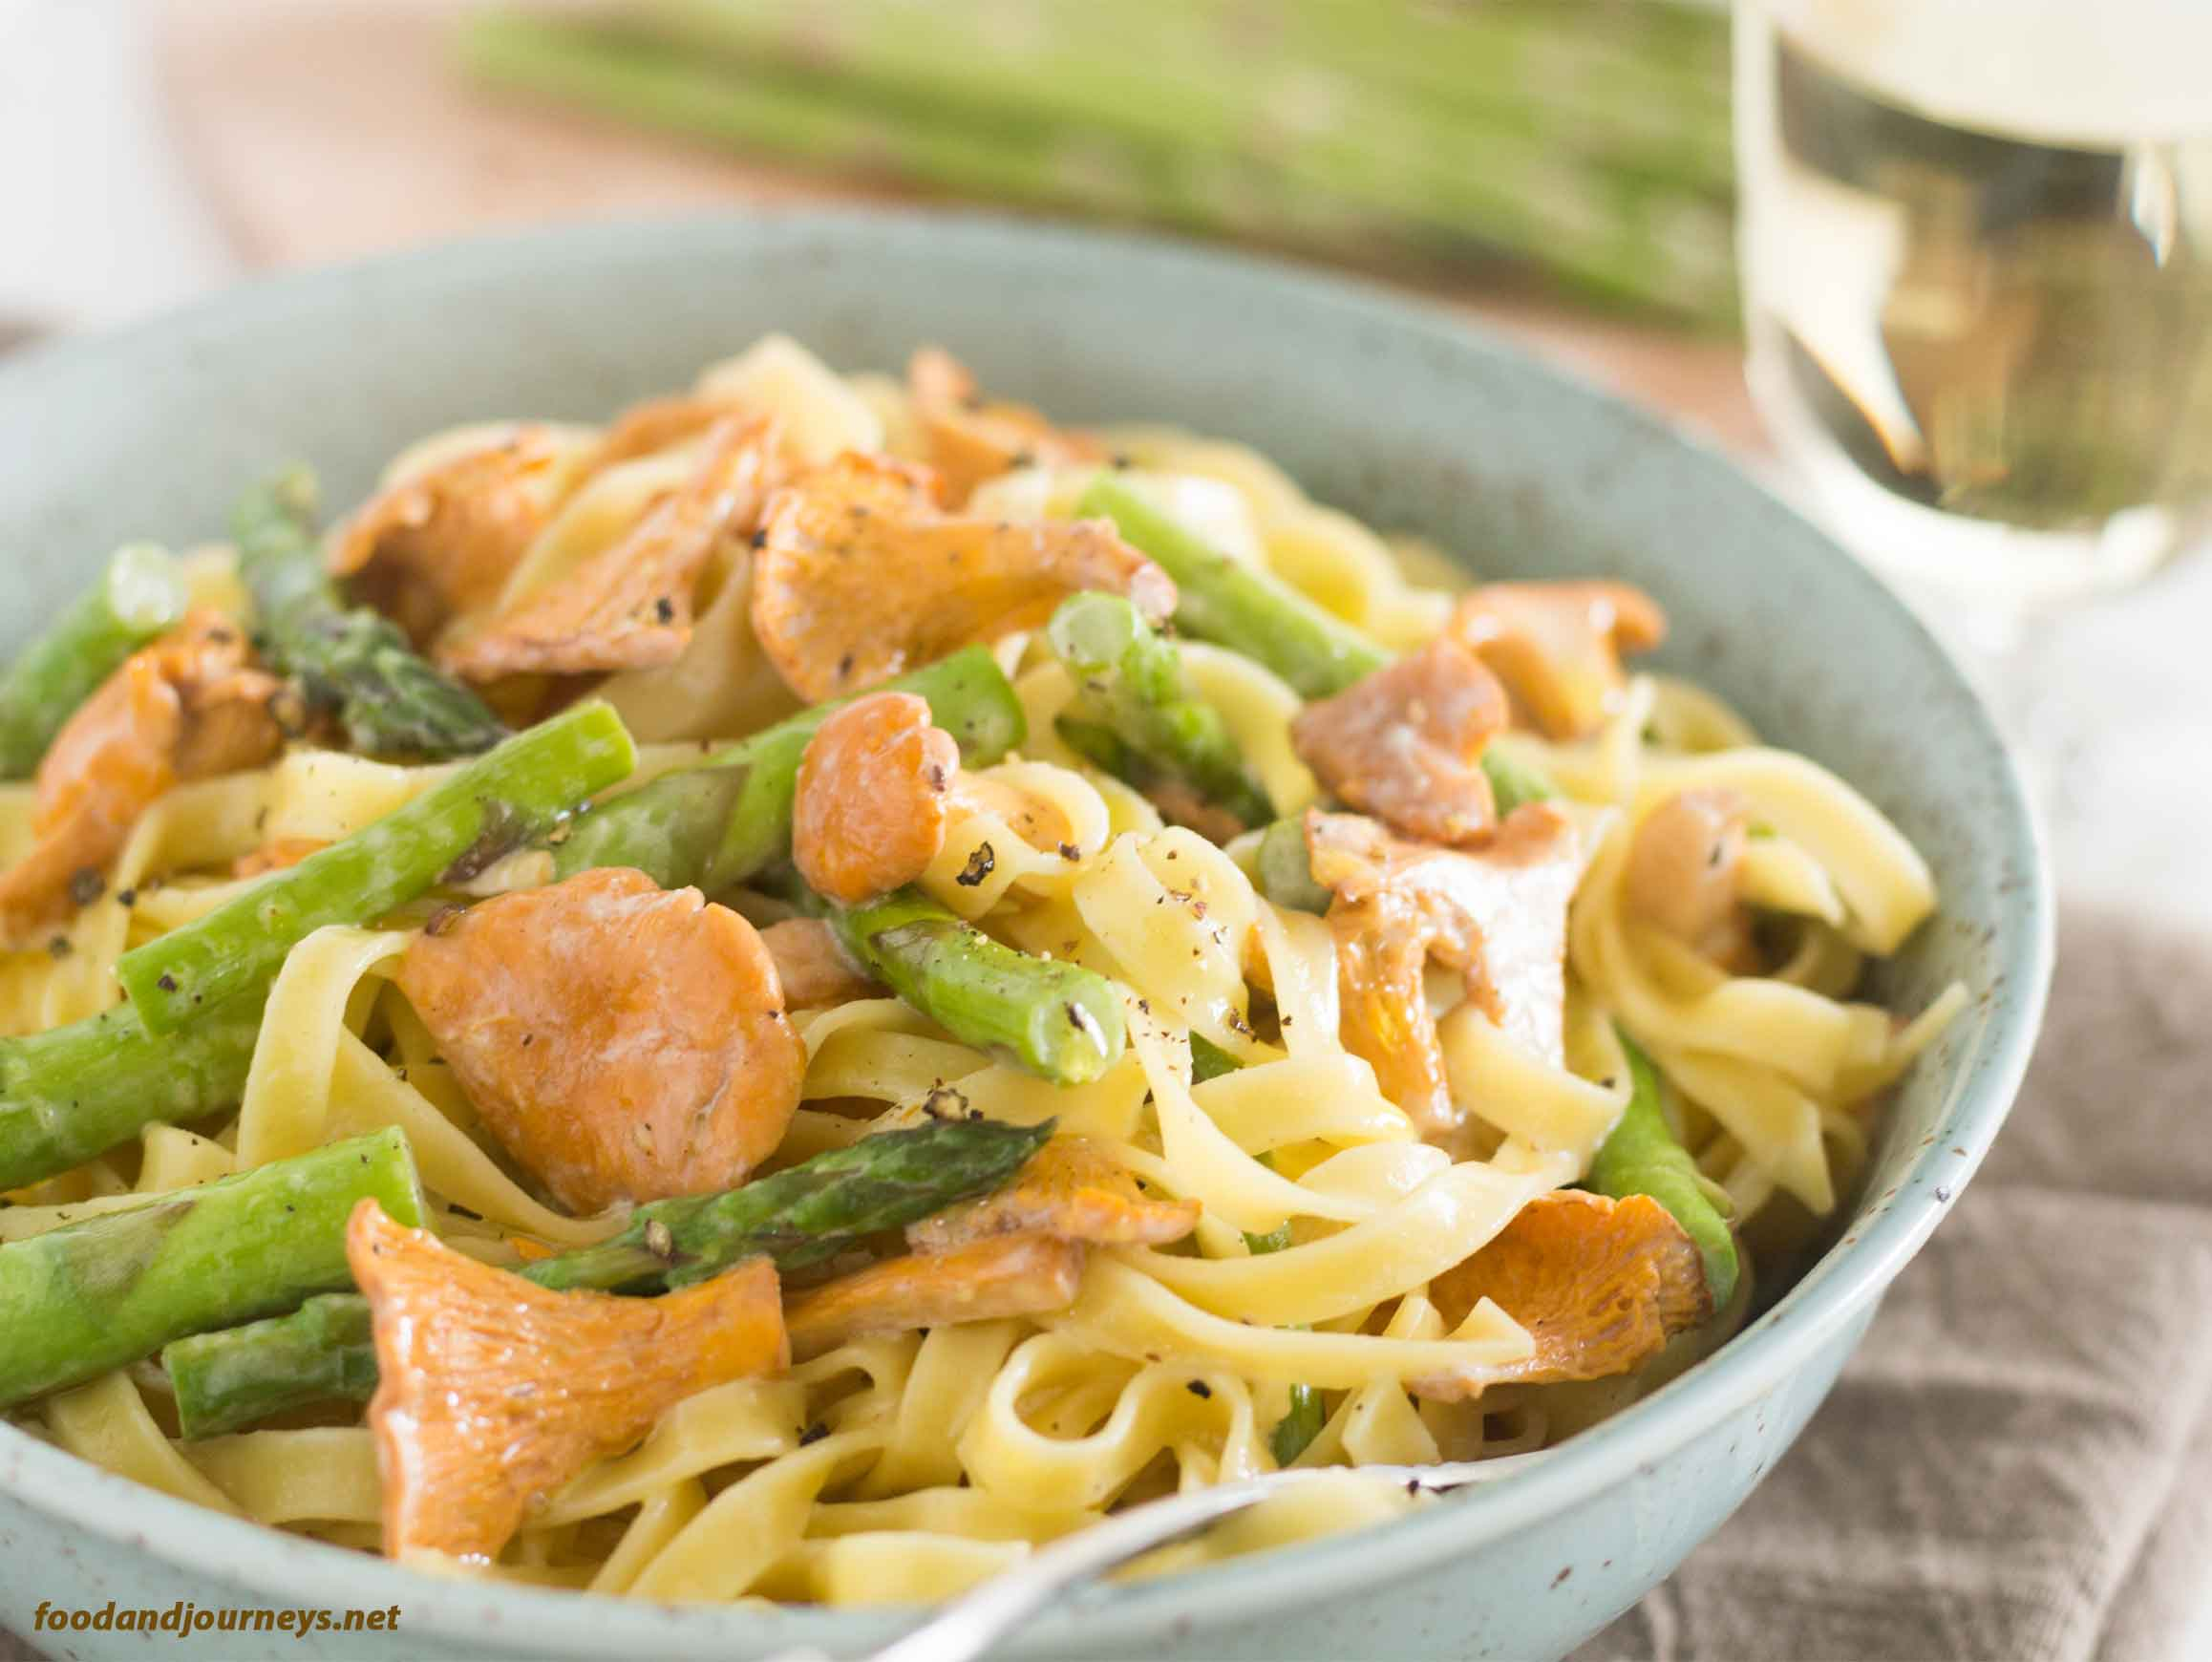 Chanterelle & Asparagus Tagliatelle MPIC|foodandjourneys.net